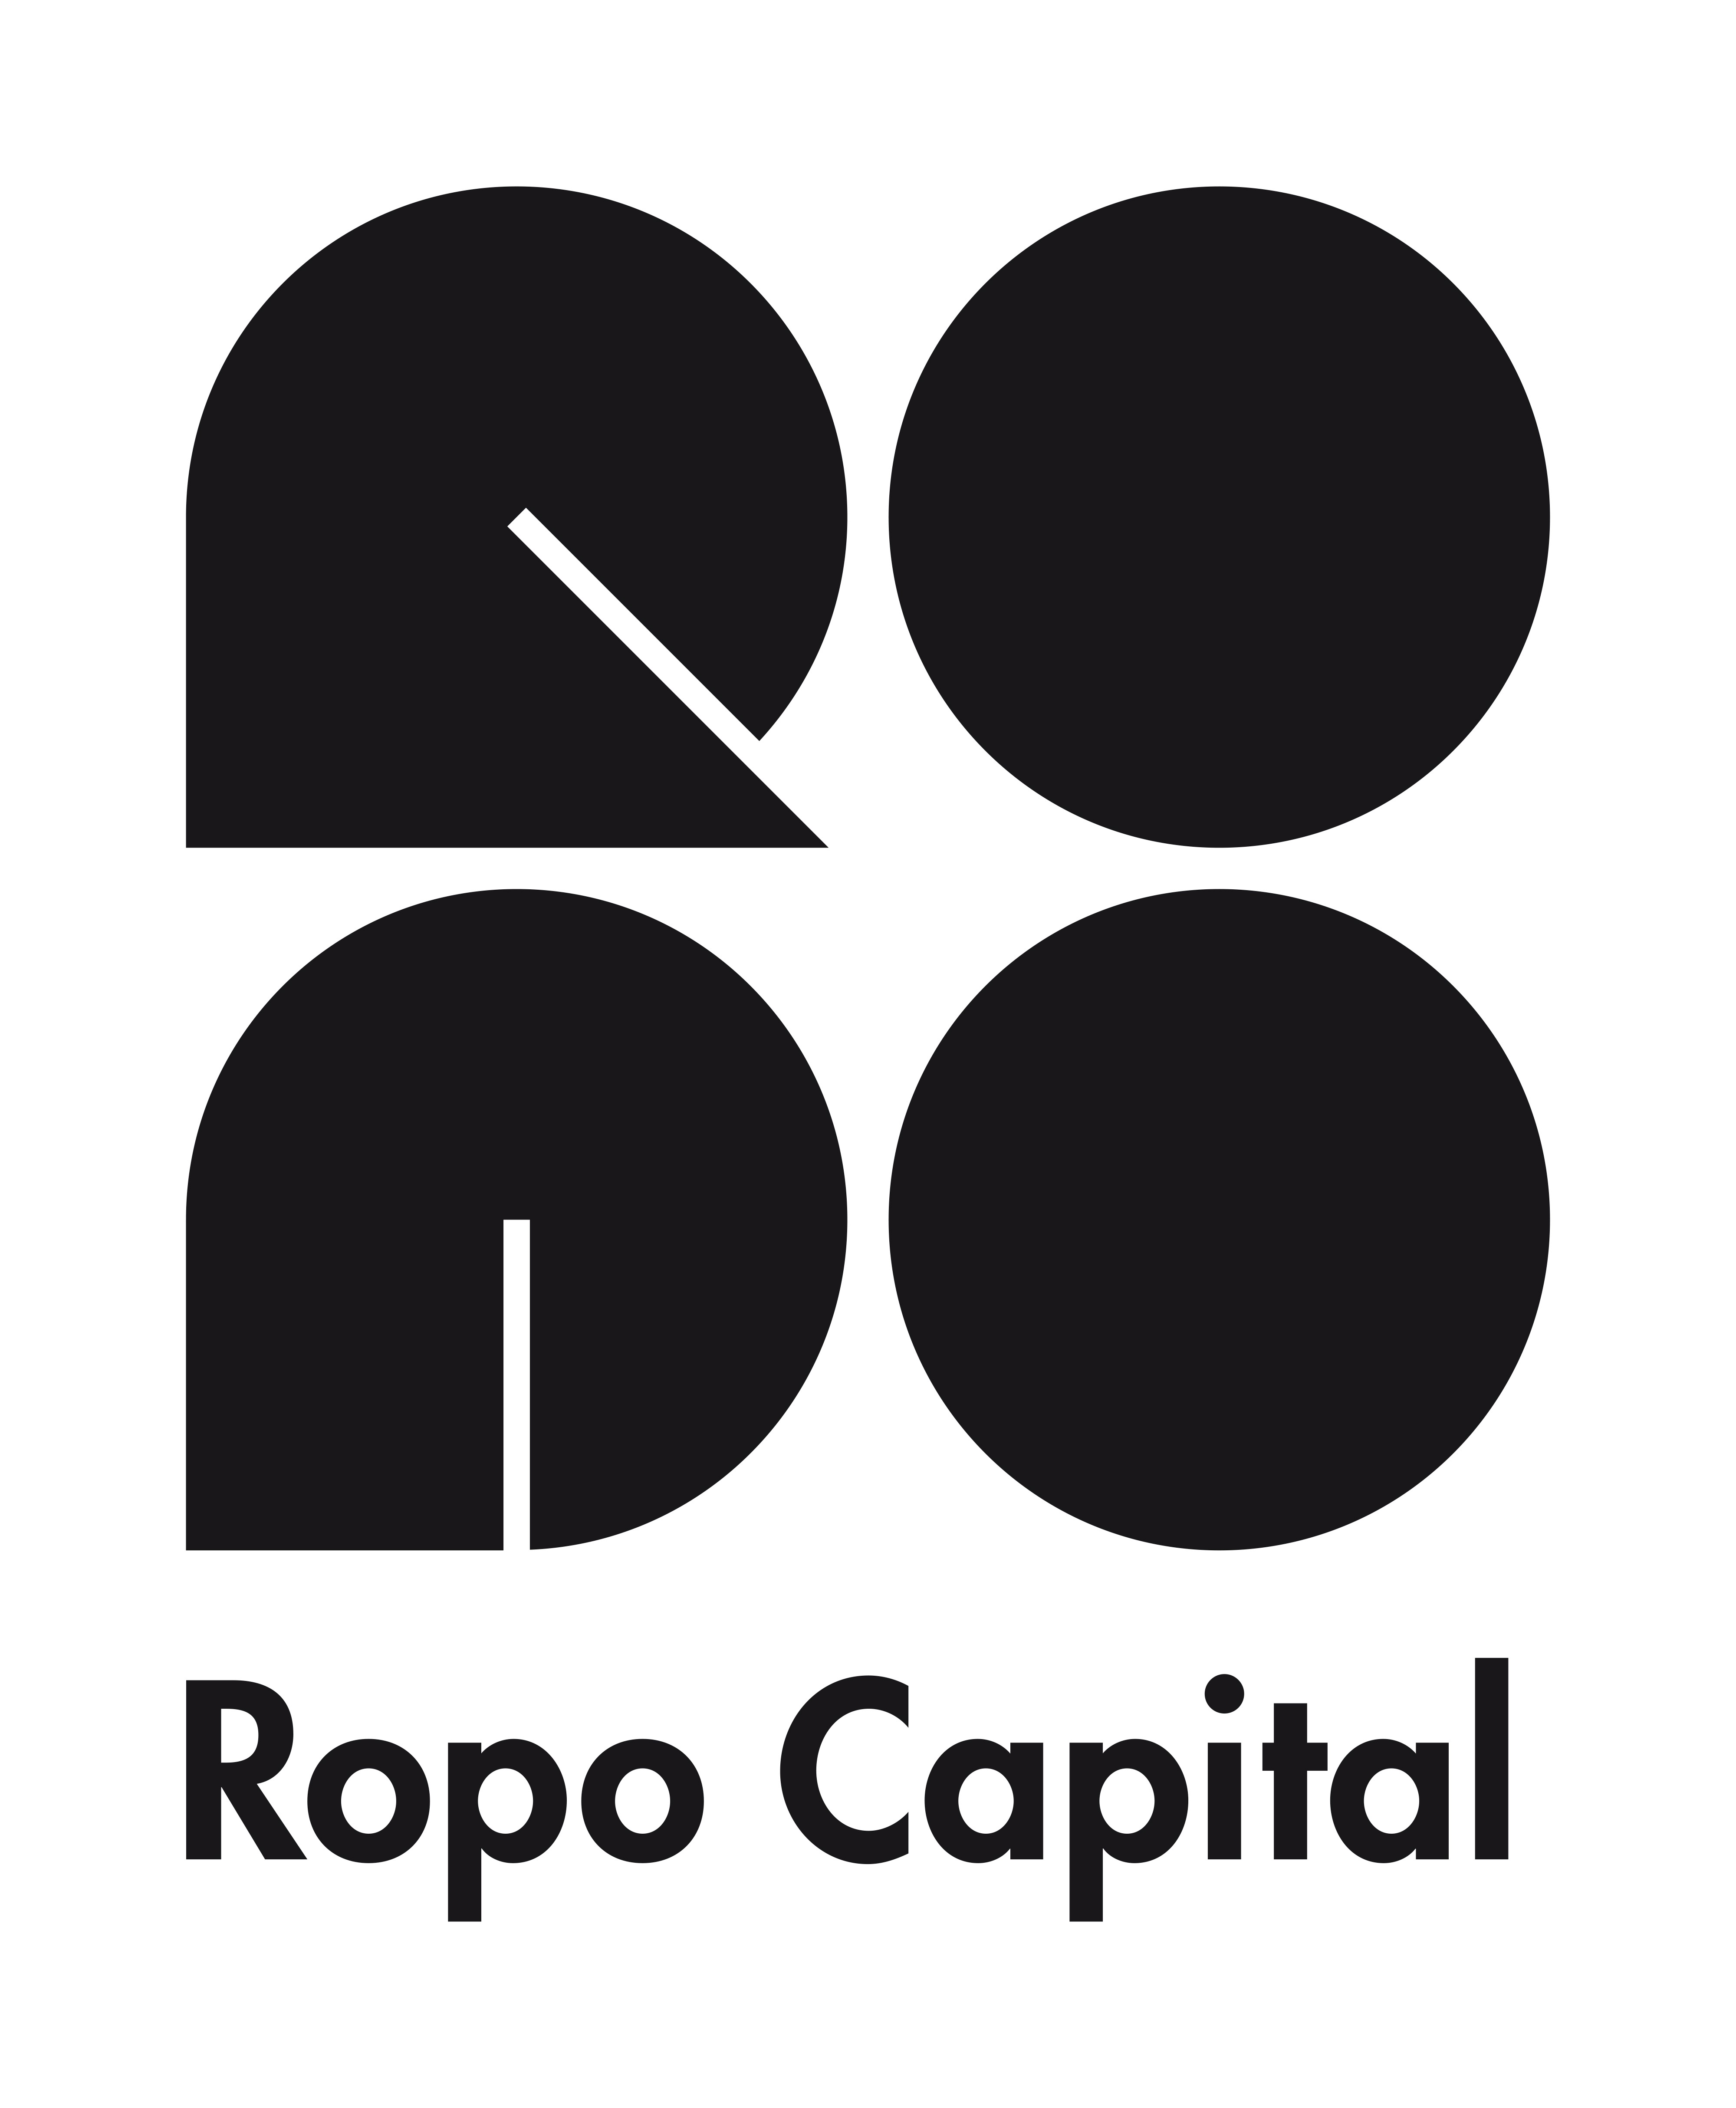 Ropo Capital logo